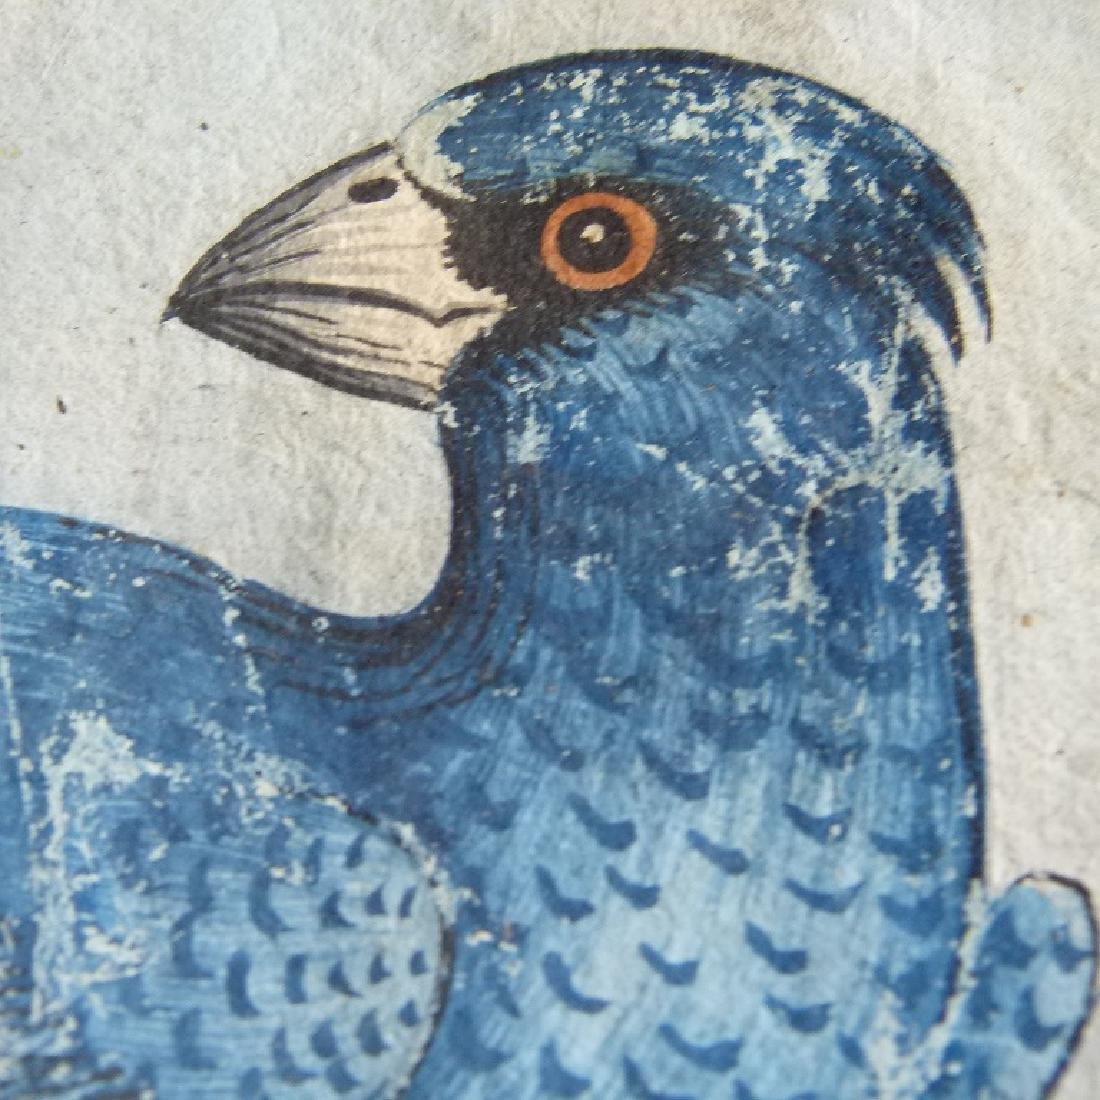 W/C GOUACHE BLUE GROSBEAK ON CHERRY BRANCH - 9